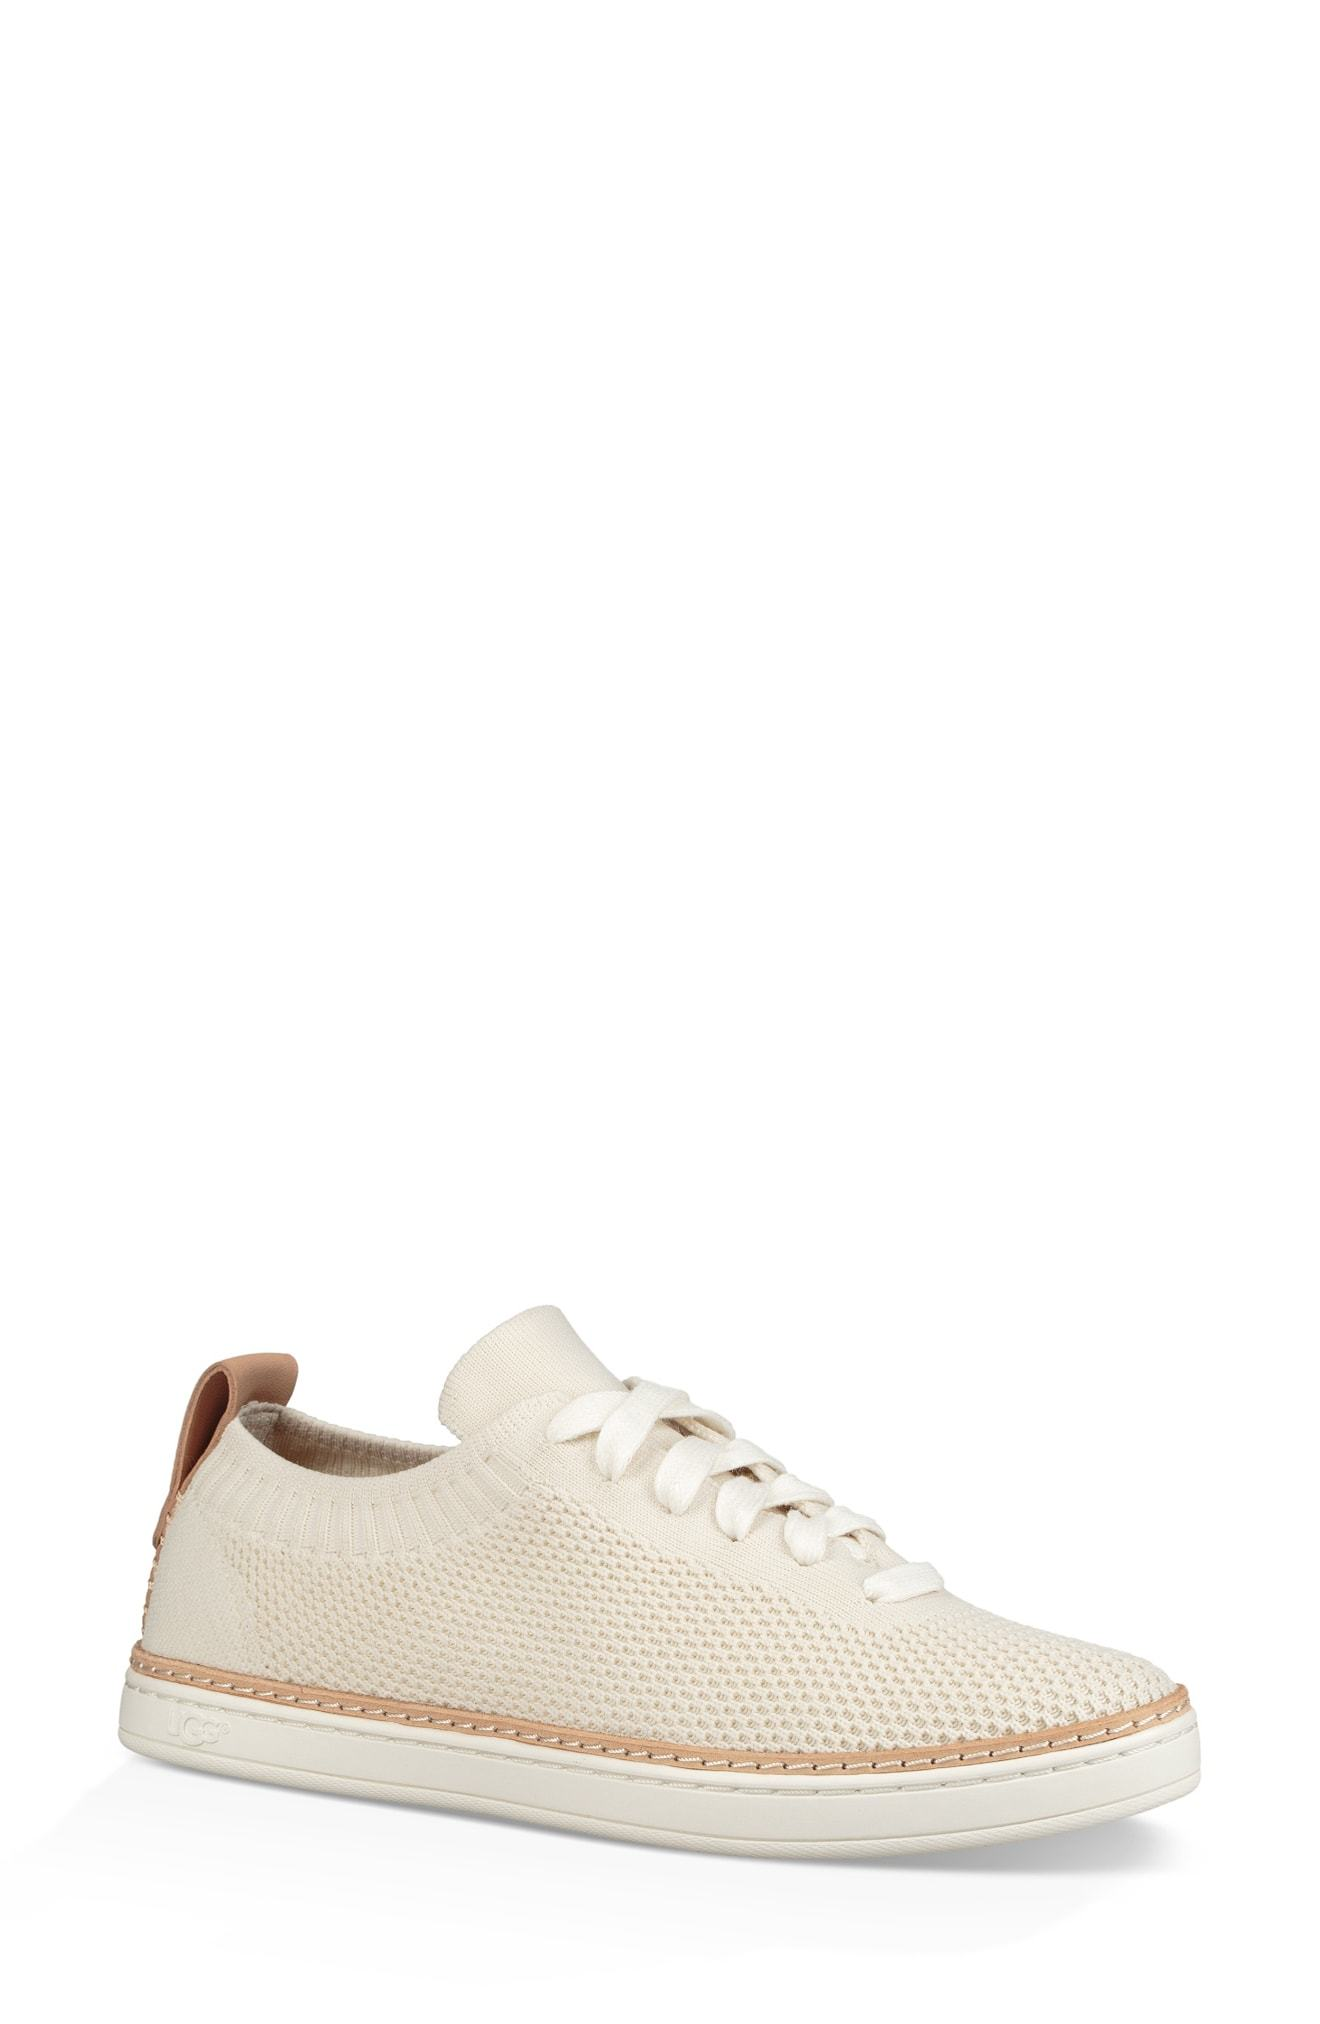 11a9079bf UGG Sidney Sneaker, $119 | Nordstrom | Lookastic.com